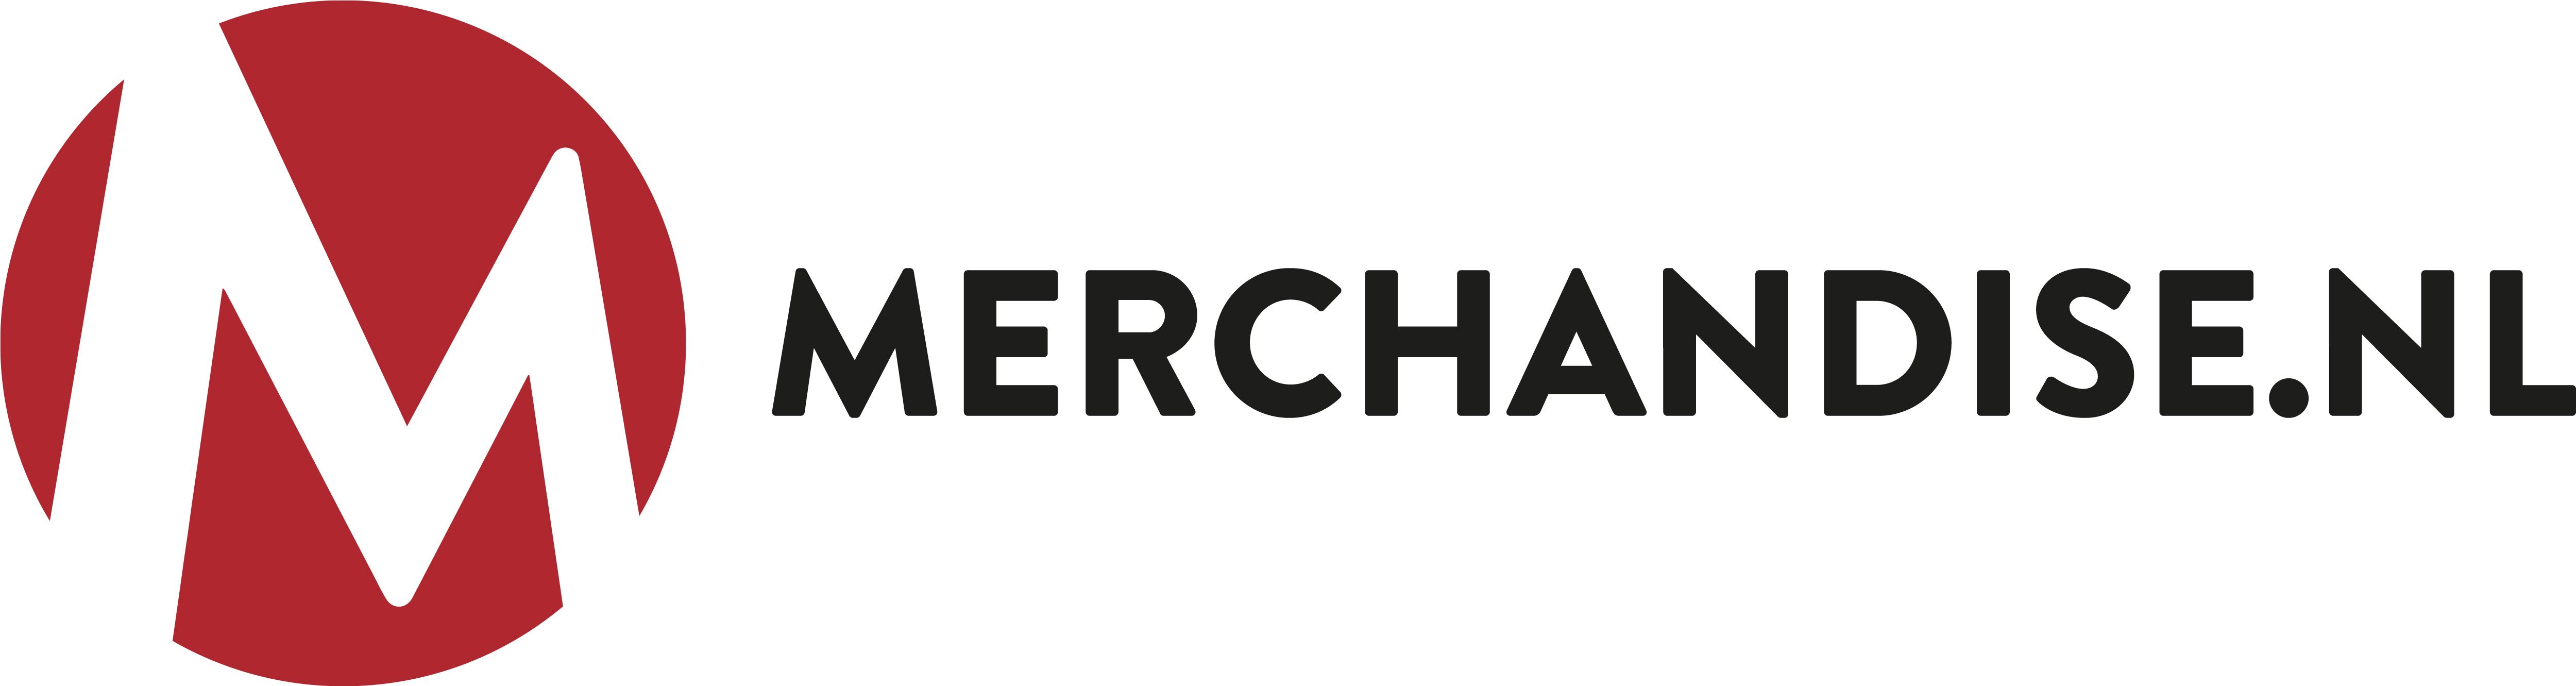 Merchandise.nl